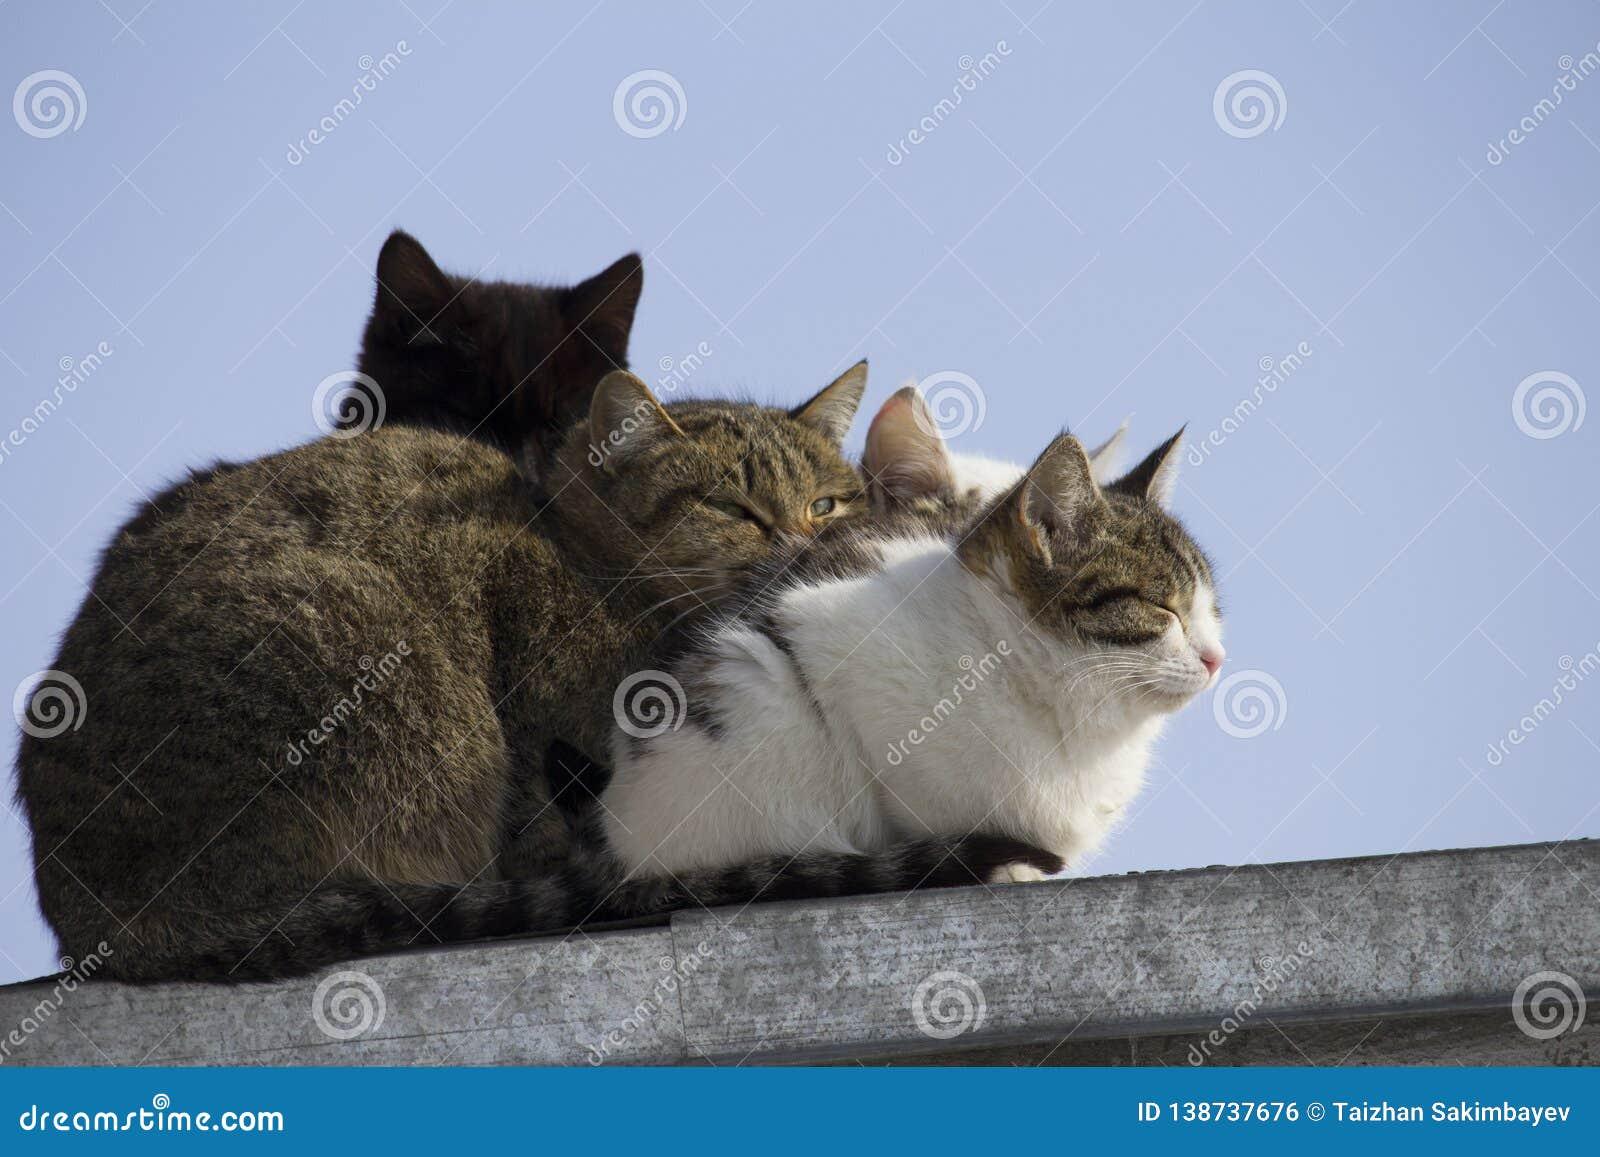 Kontur av svart katts huvud bland flera katter på taket